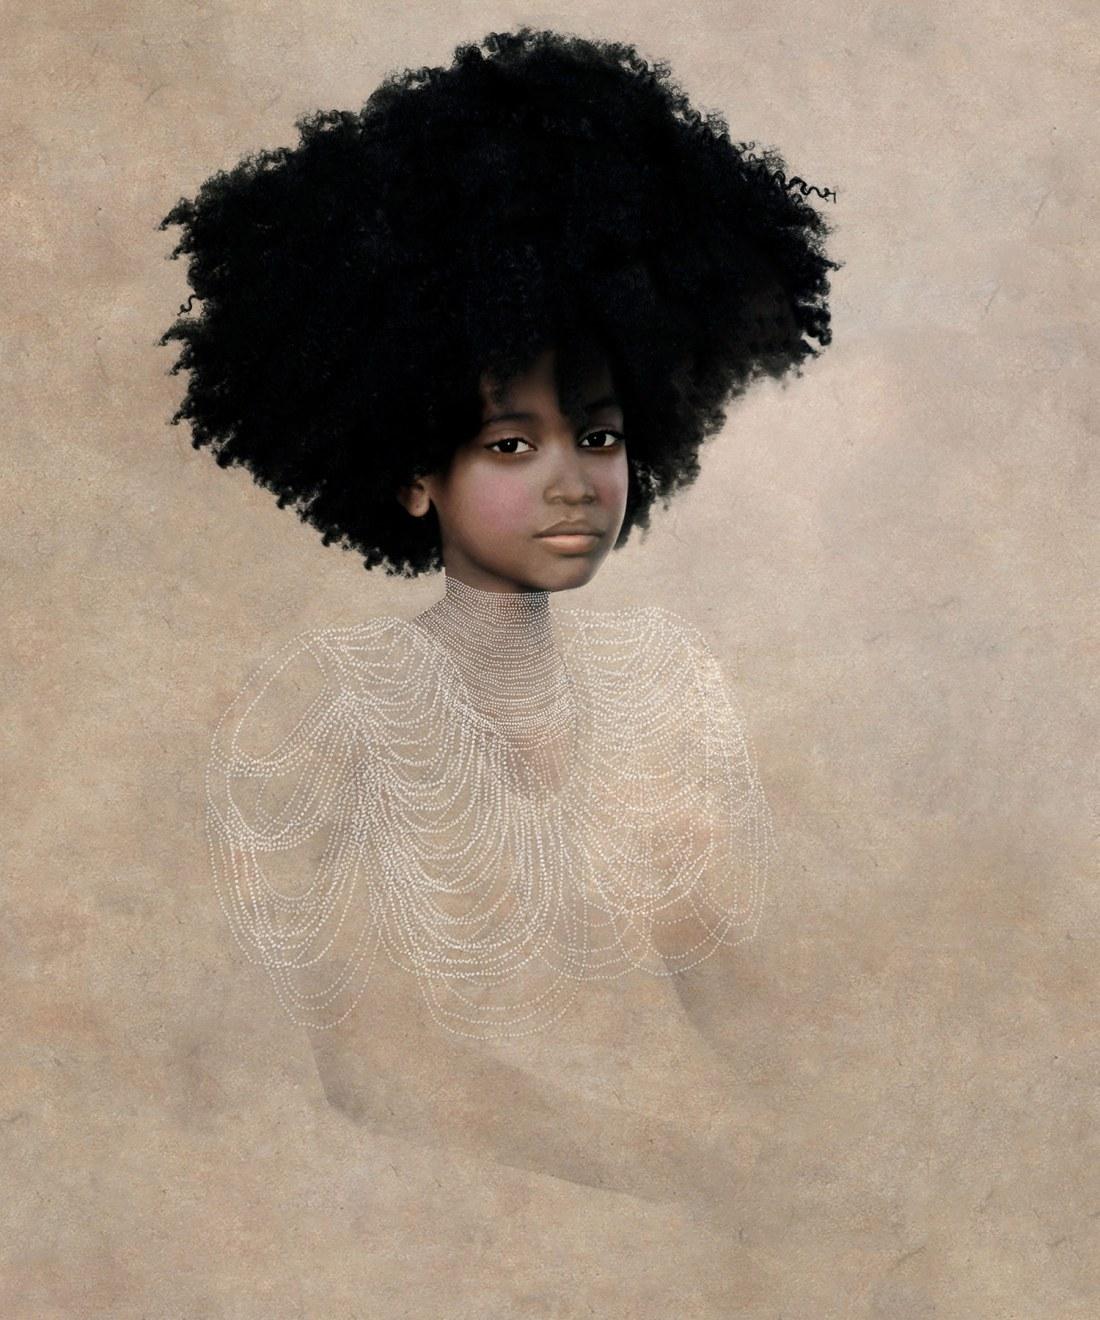 Tawny Chatmon, African American Art, Black Art, African American Photography, Black Photography, KOLUMN Magazine, KOLUMN, KINDR'D Magazine, KINDR'D